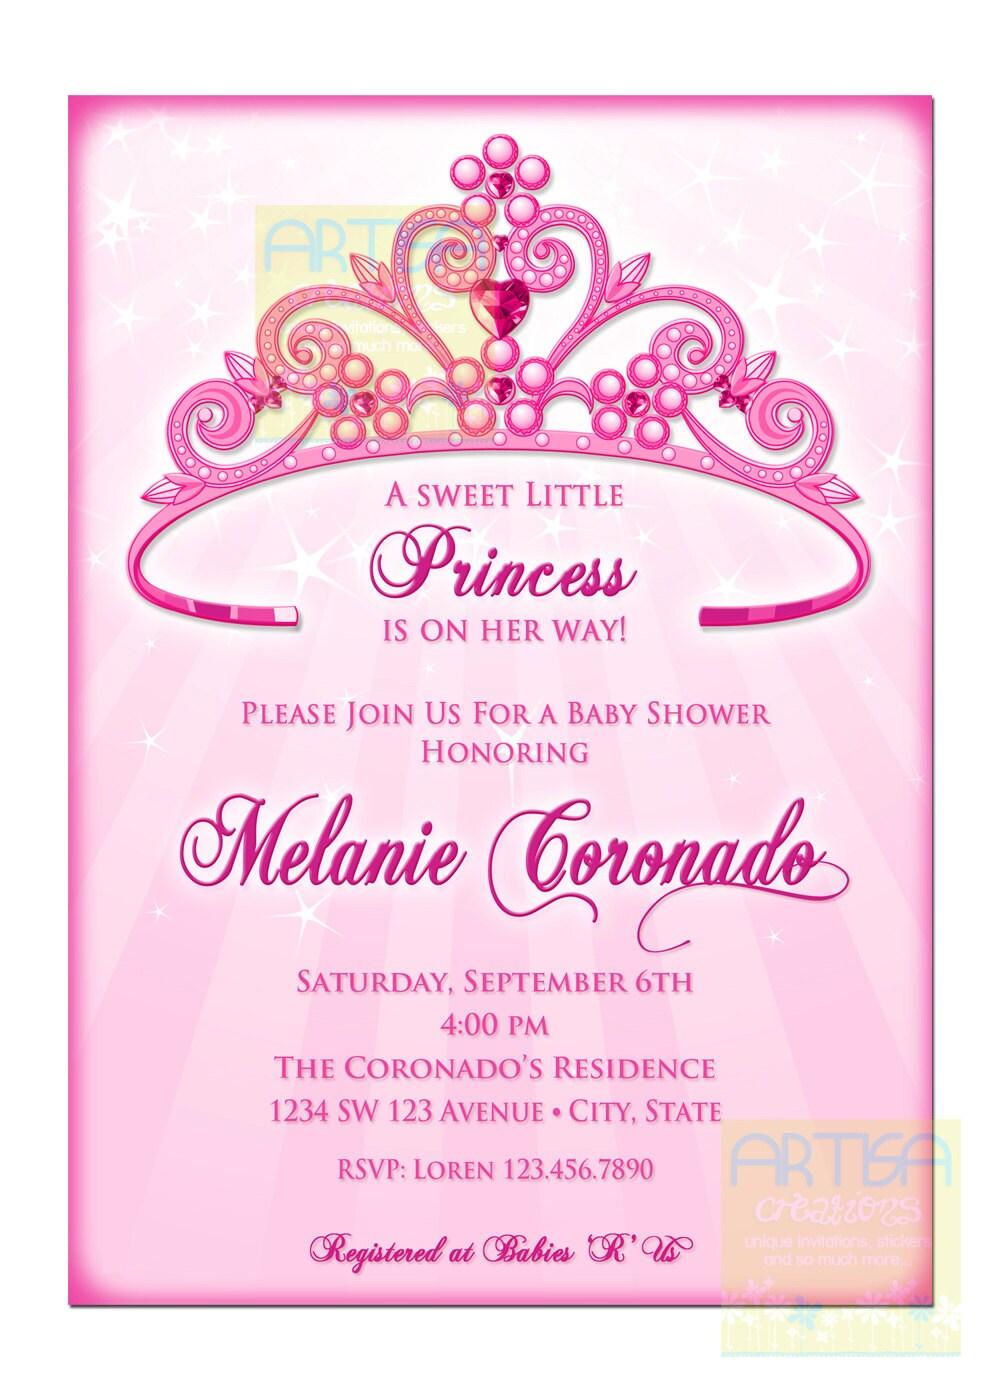 Princess Baby Shower Invitation DIY Princess Crown Baby